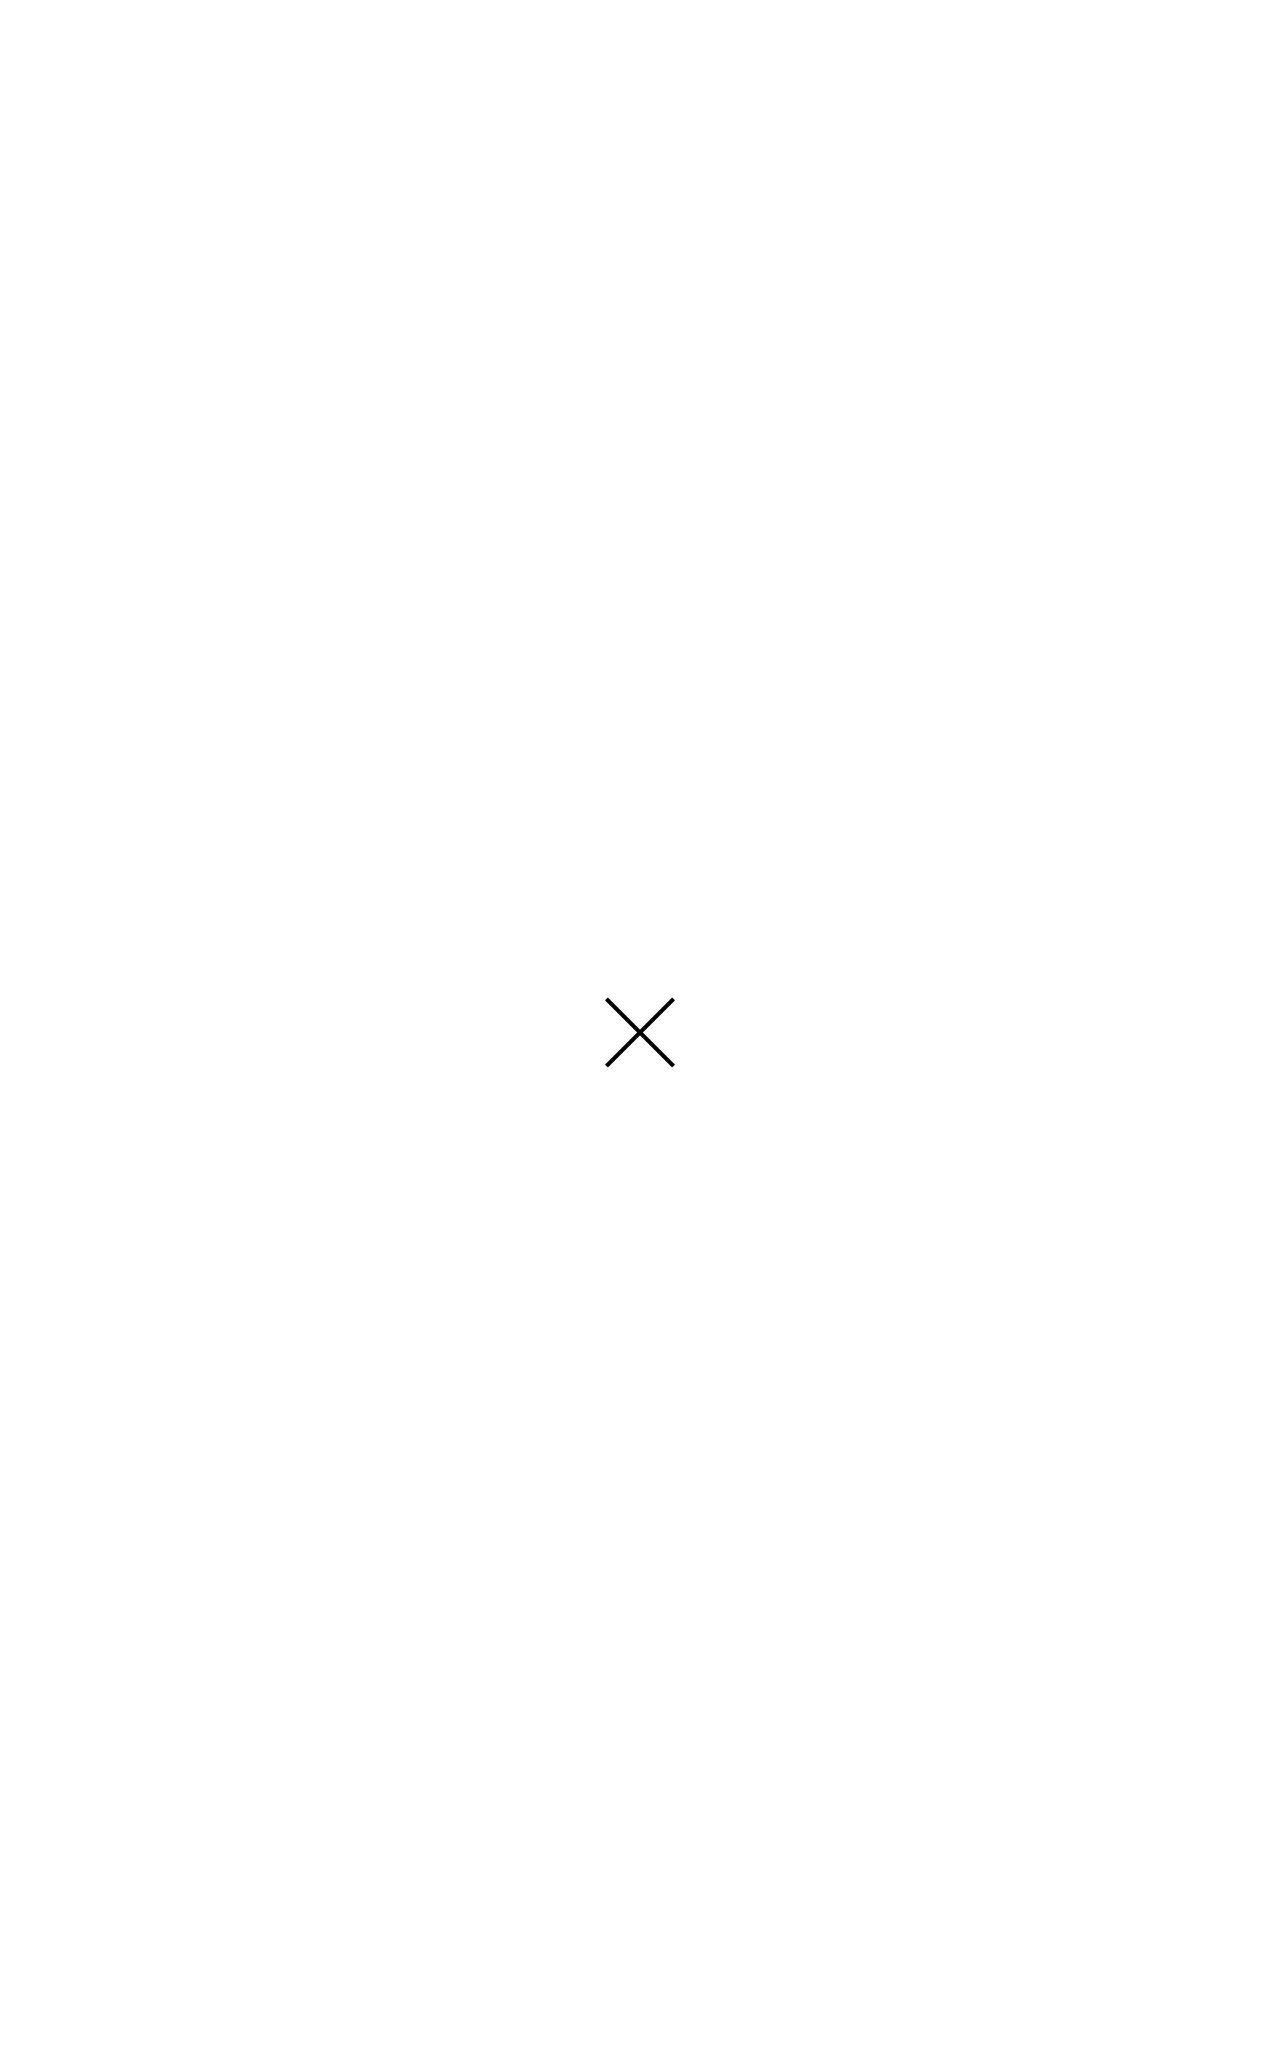 Blanco_1_dot